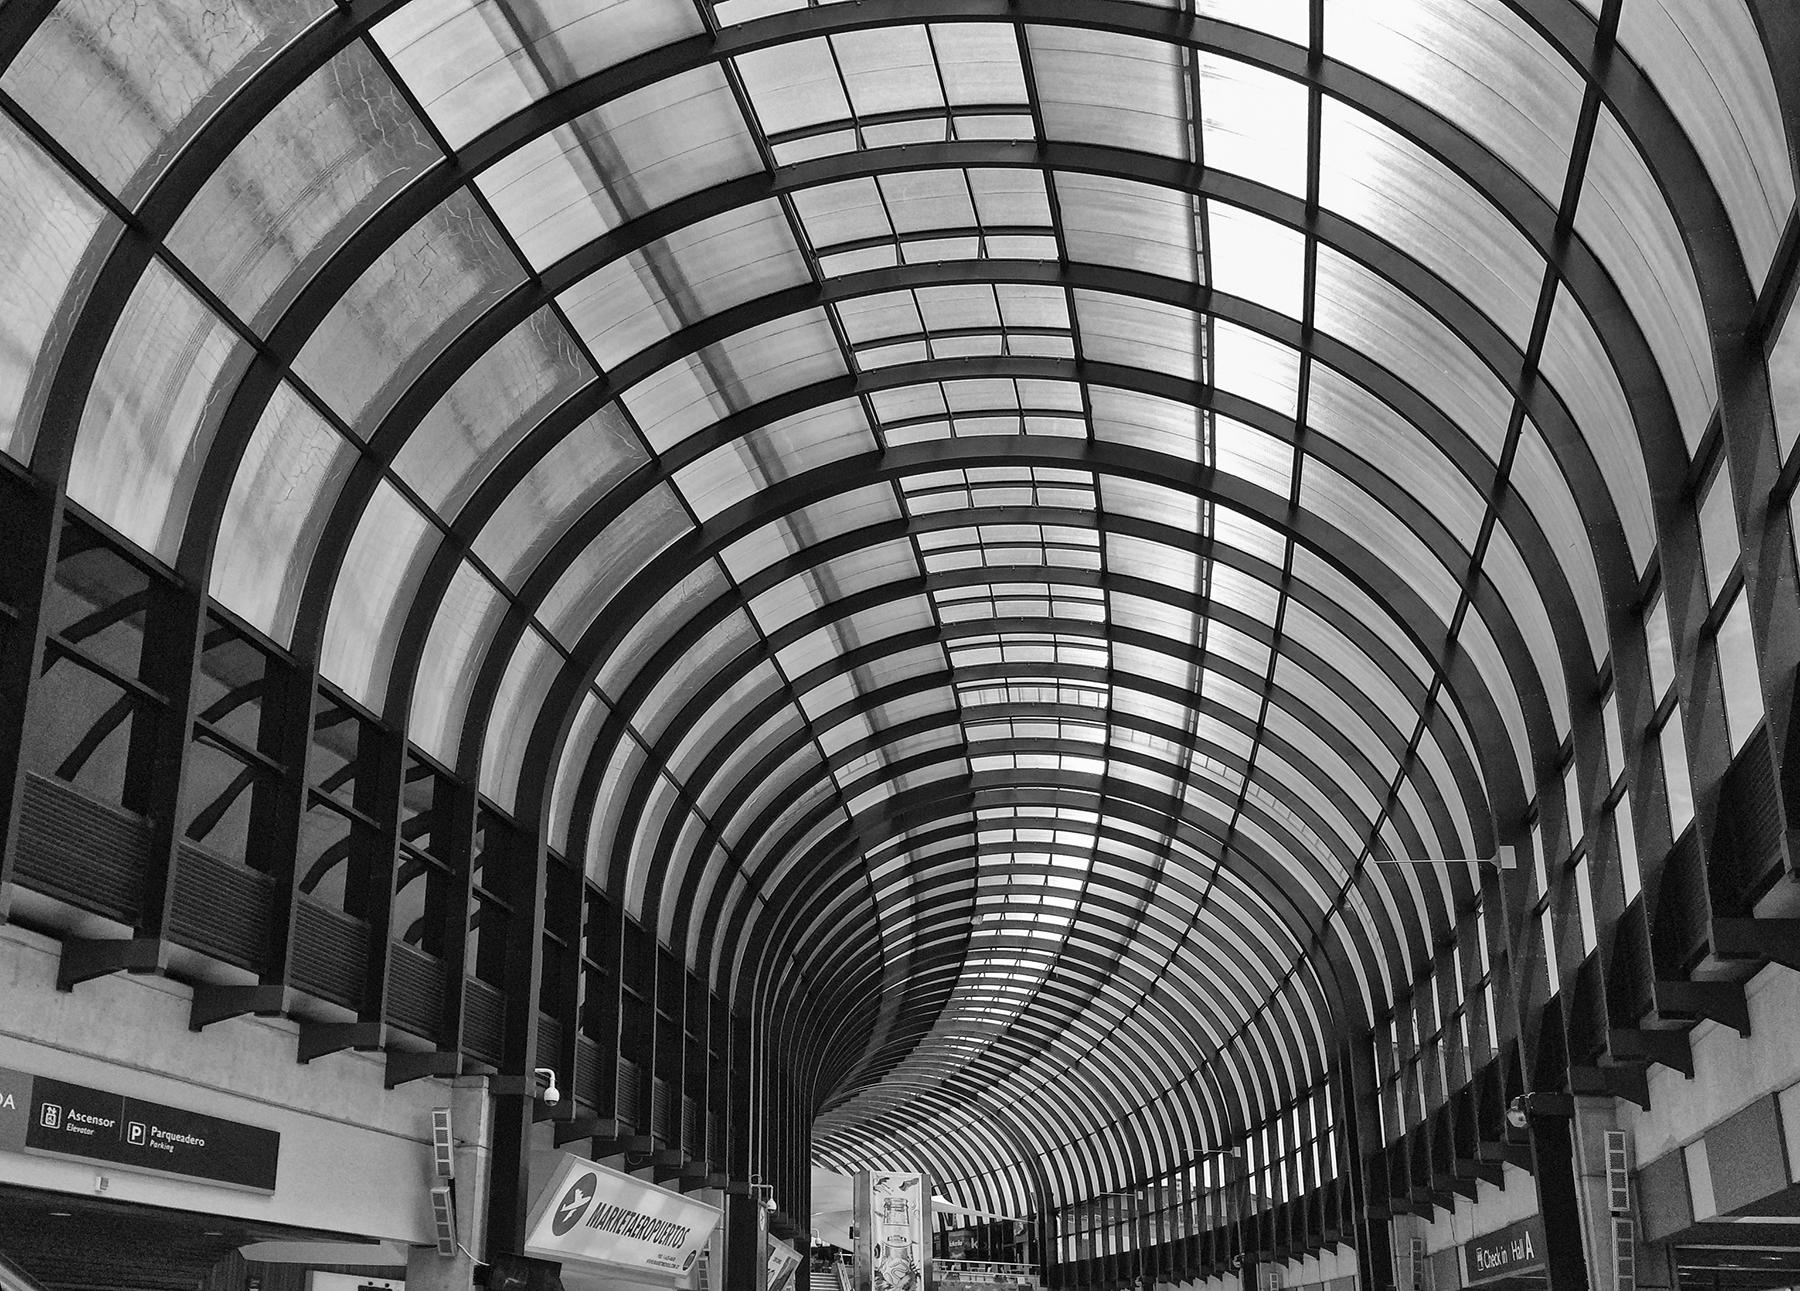 Brian_Jones_Whorls_Whorl 3 - Medellin Airport_3.jpg